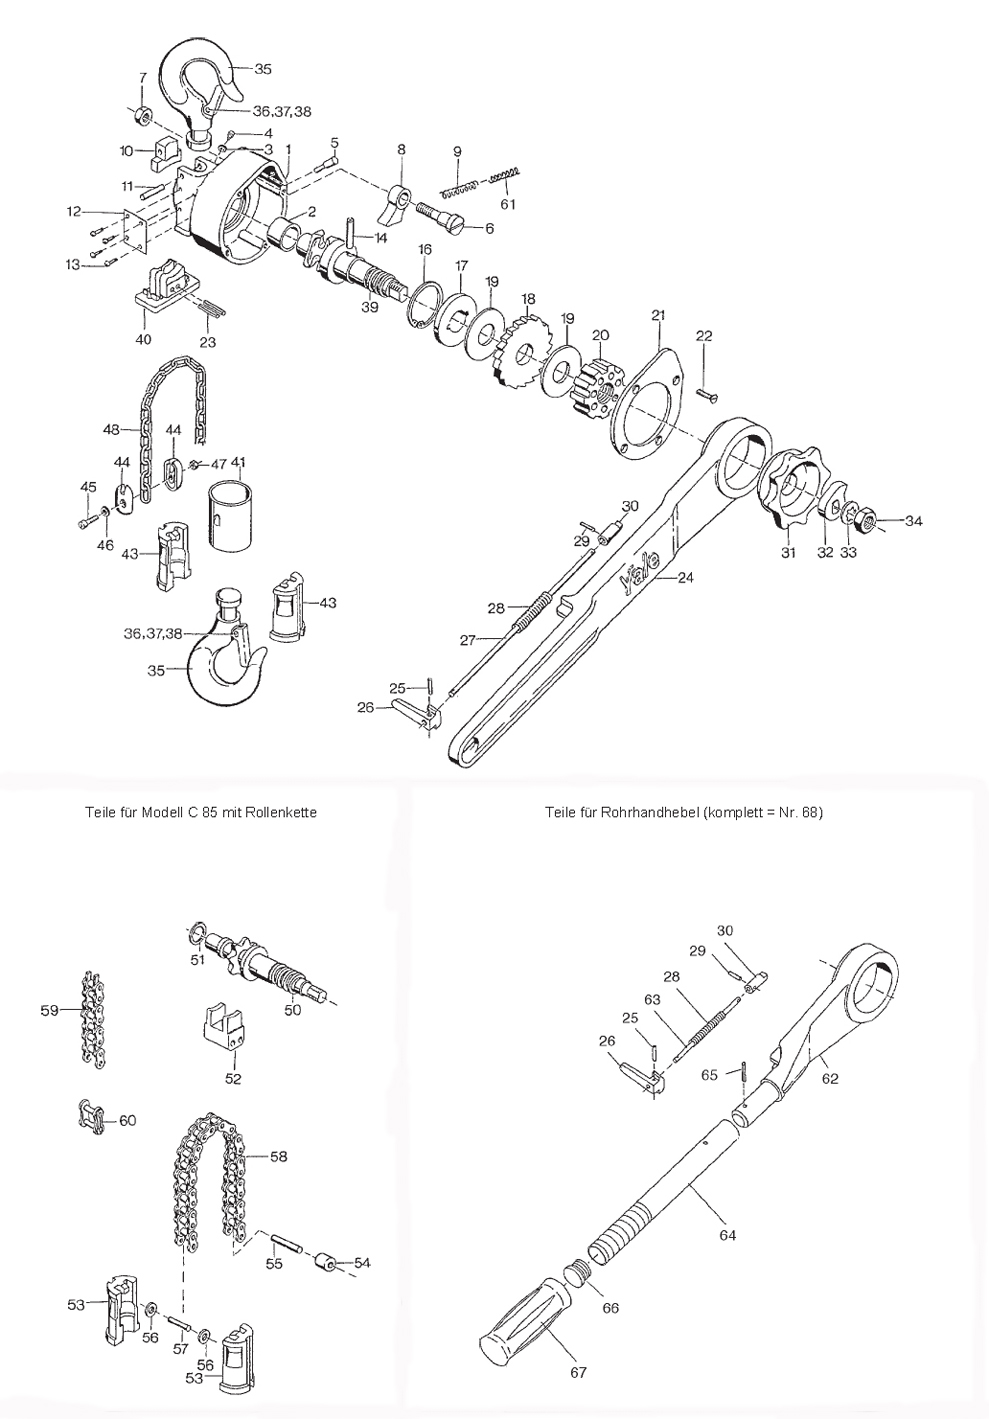 Nett 5 Tonnen Yale Drahtseilzug Galerie - Schaltplan Serie Circuit ...